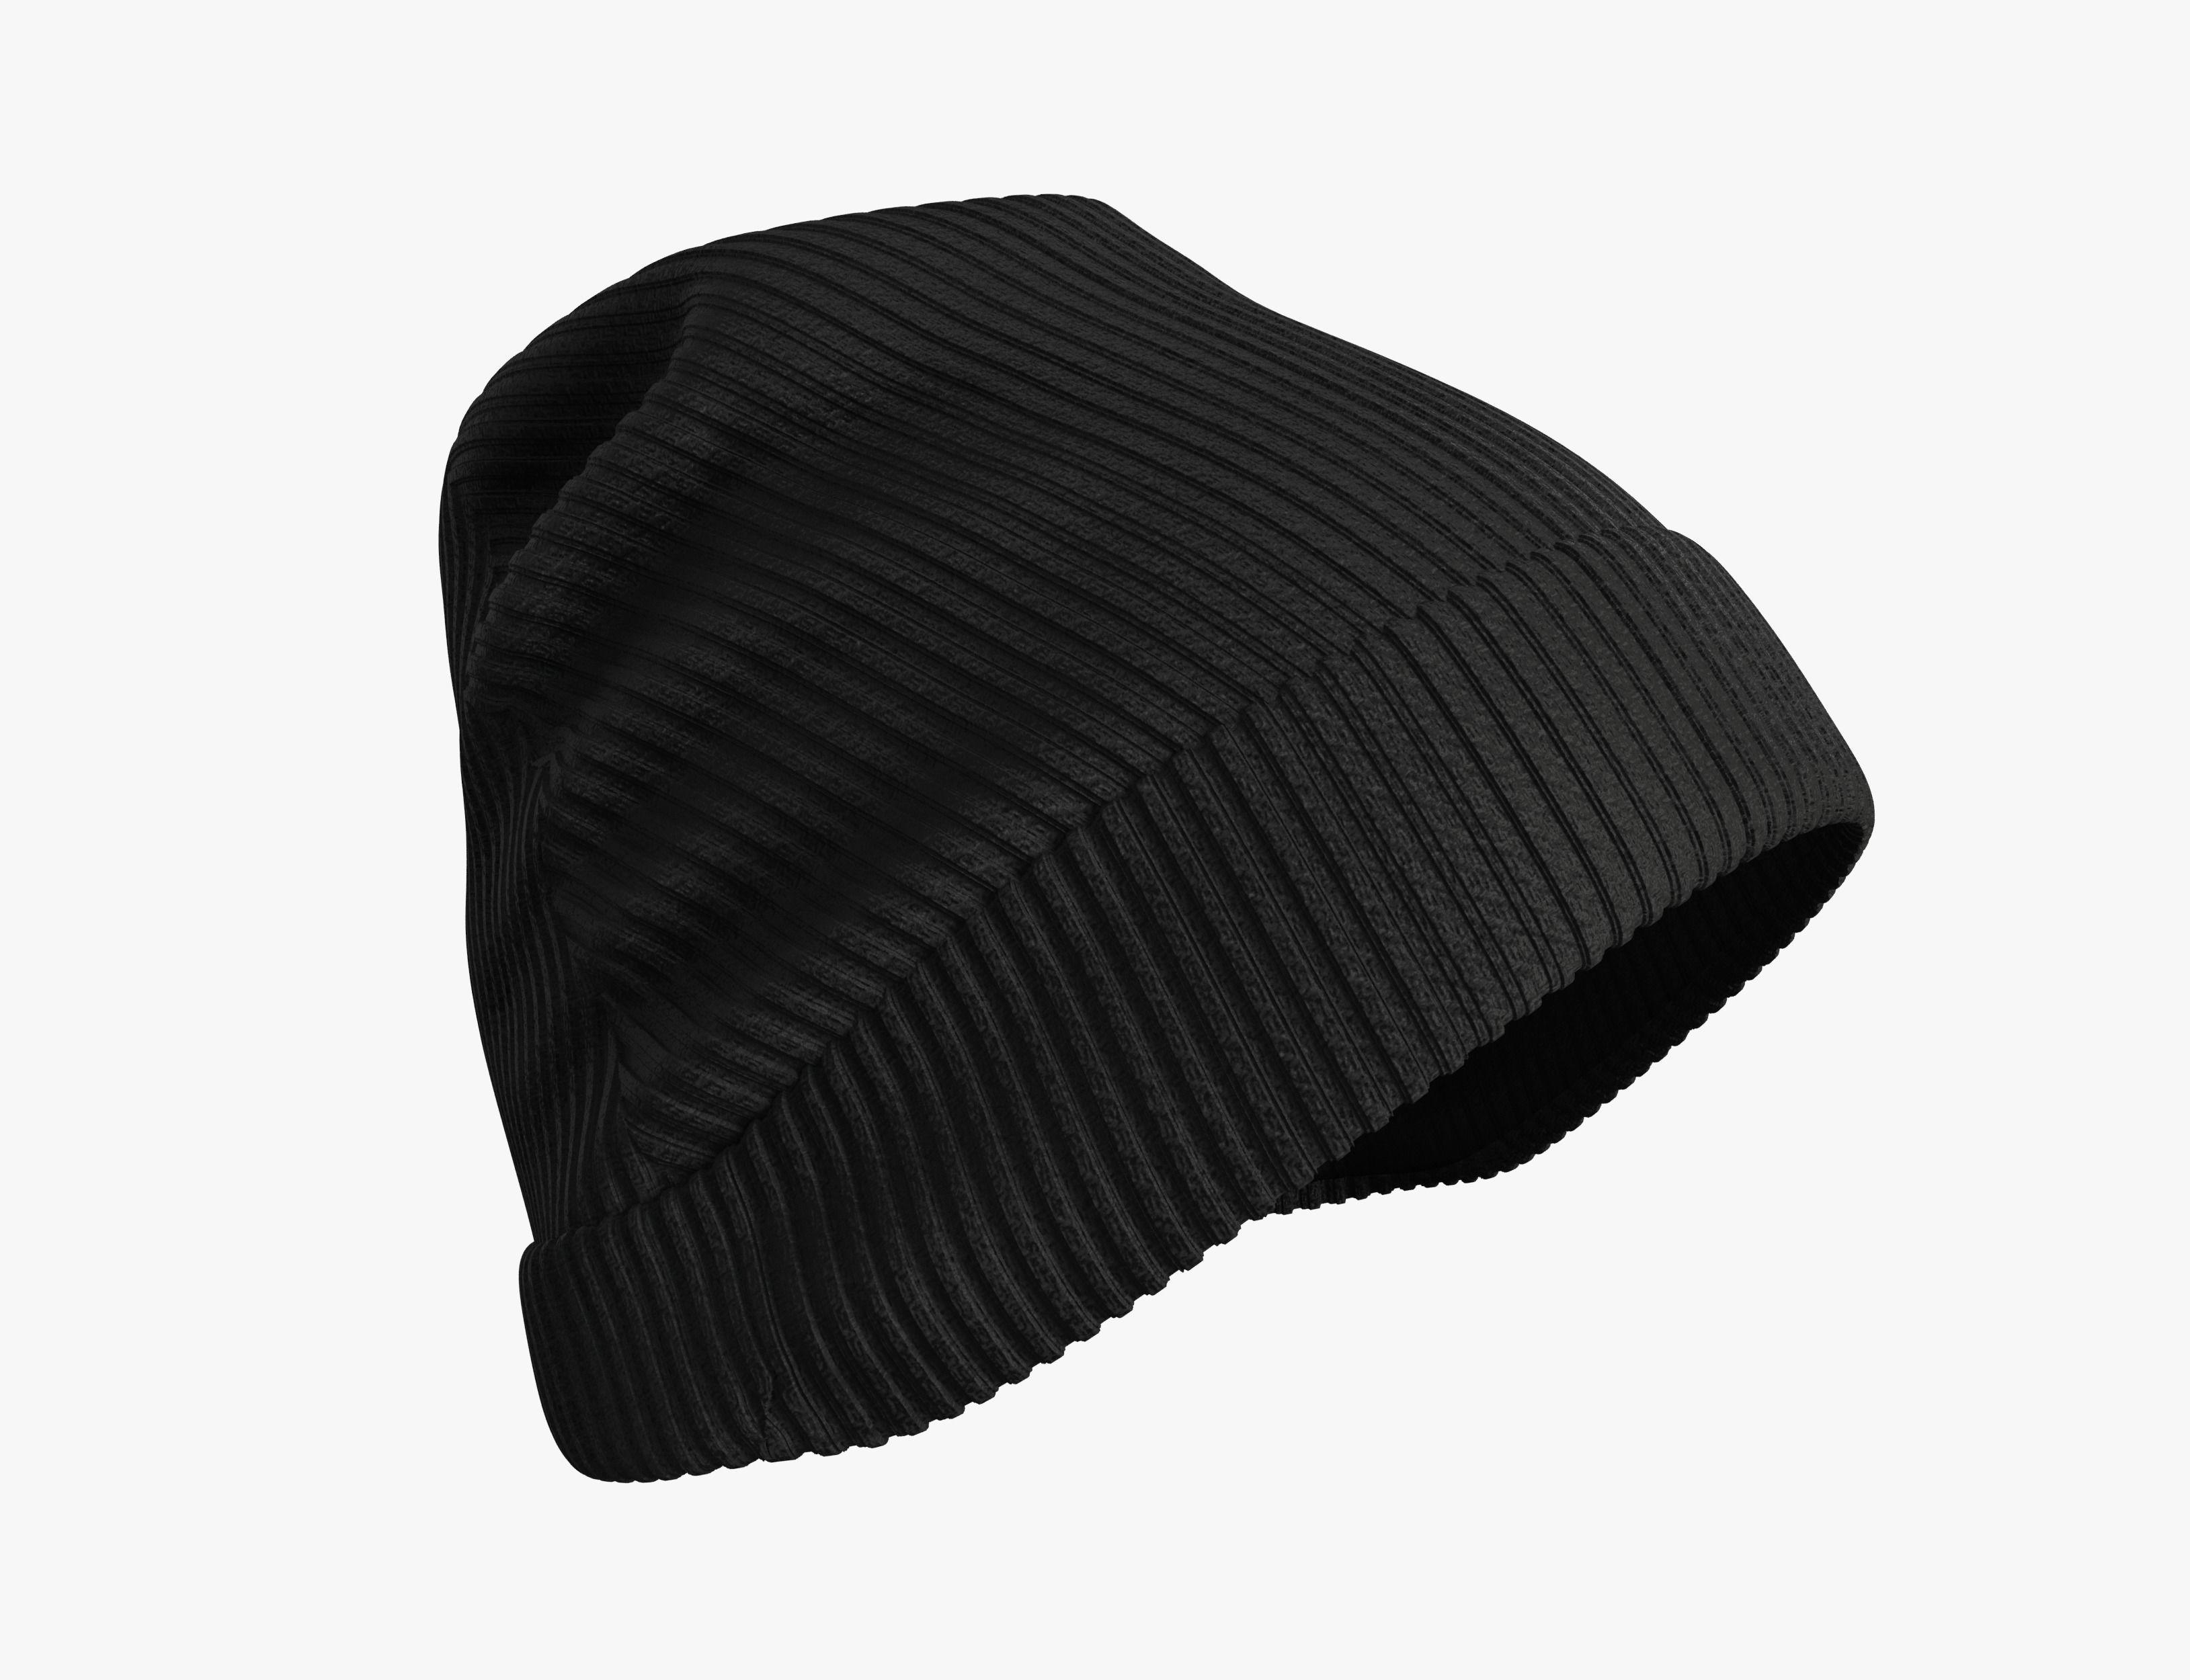 711cda3b2b6 winter hat 3d model low-poly max obj mtl fbx 1 ...